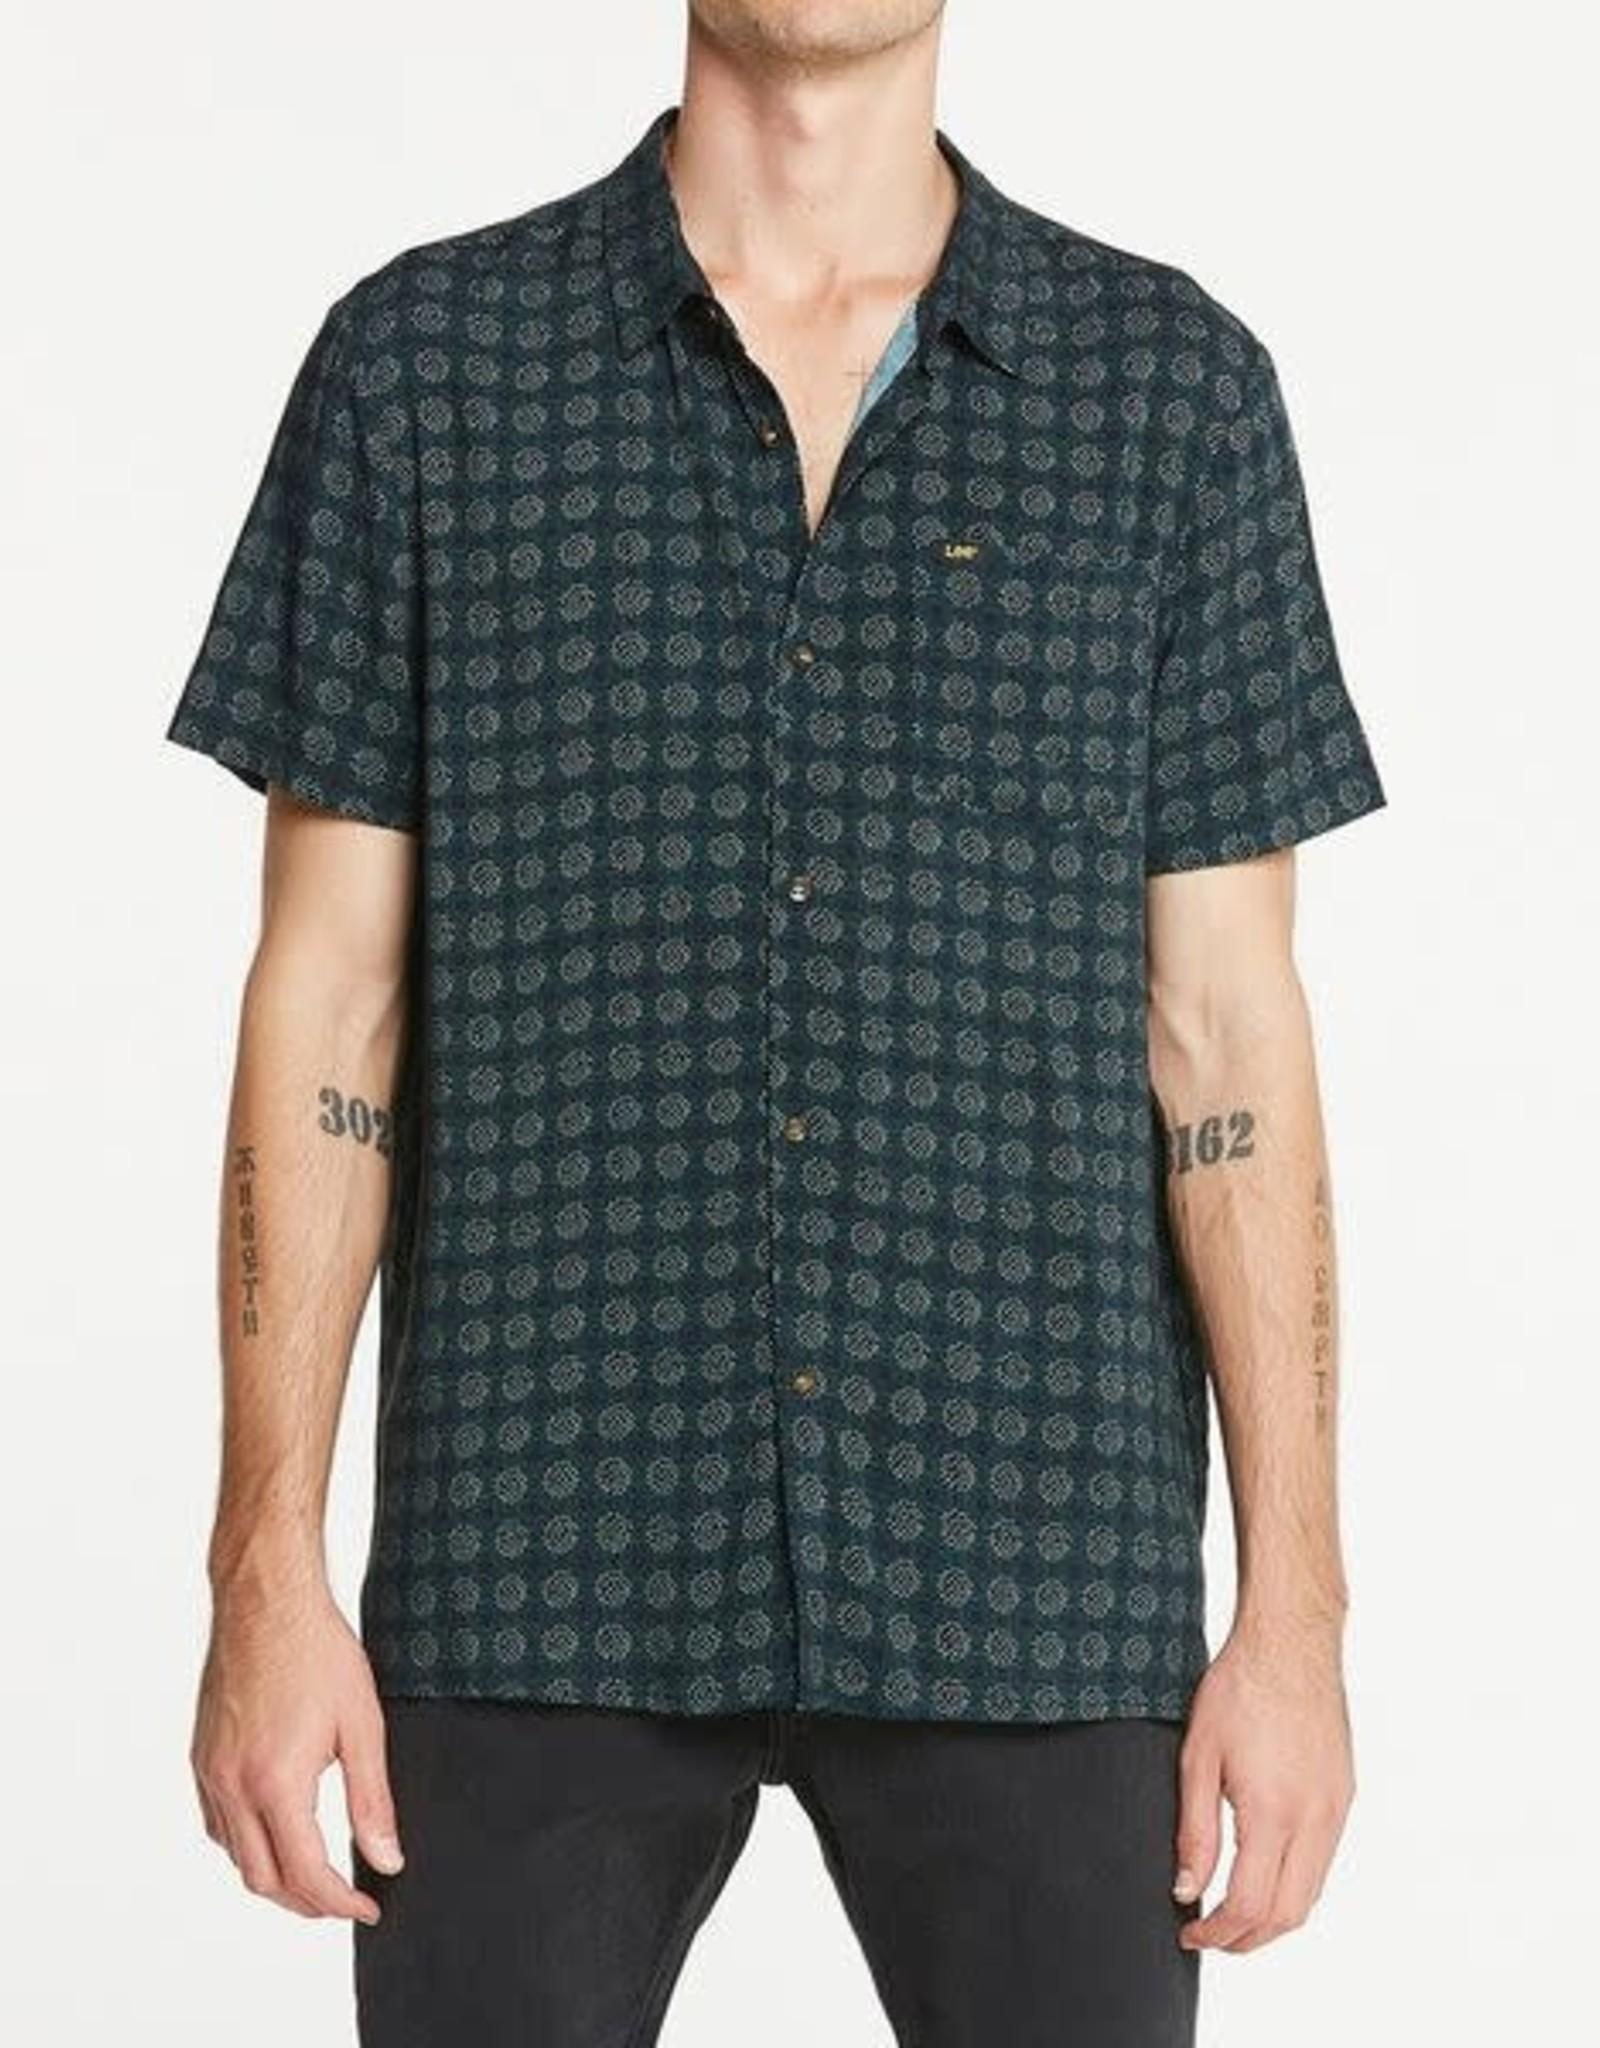 LEE Pop Rocks S/S Shirt